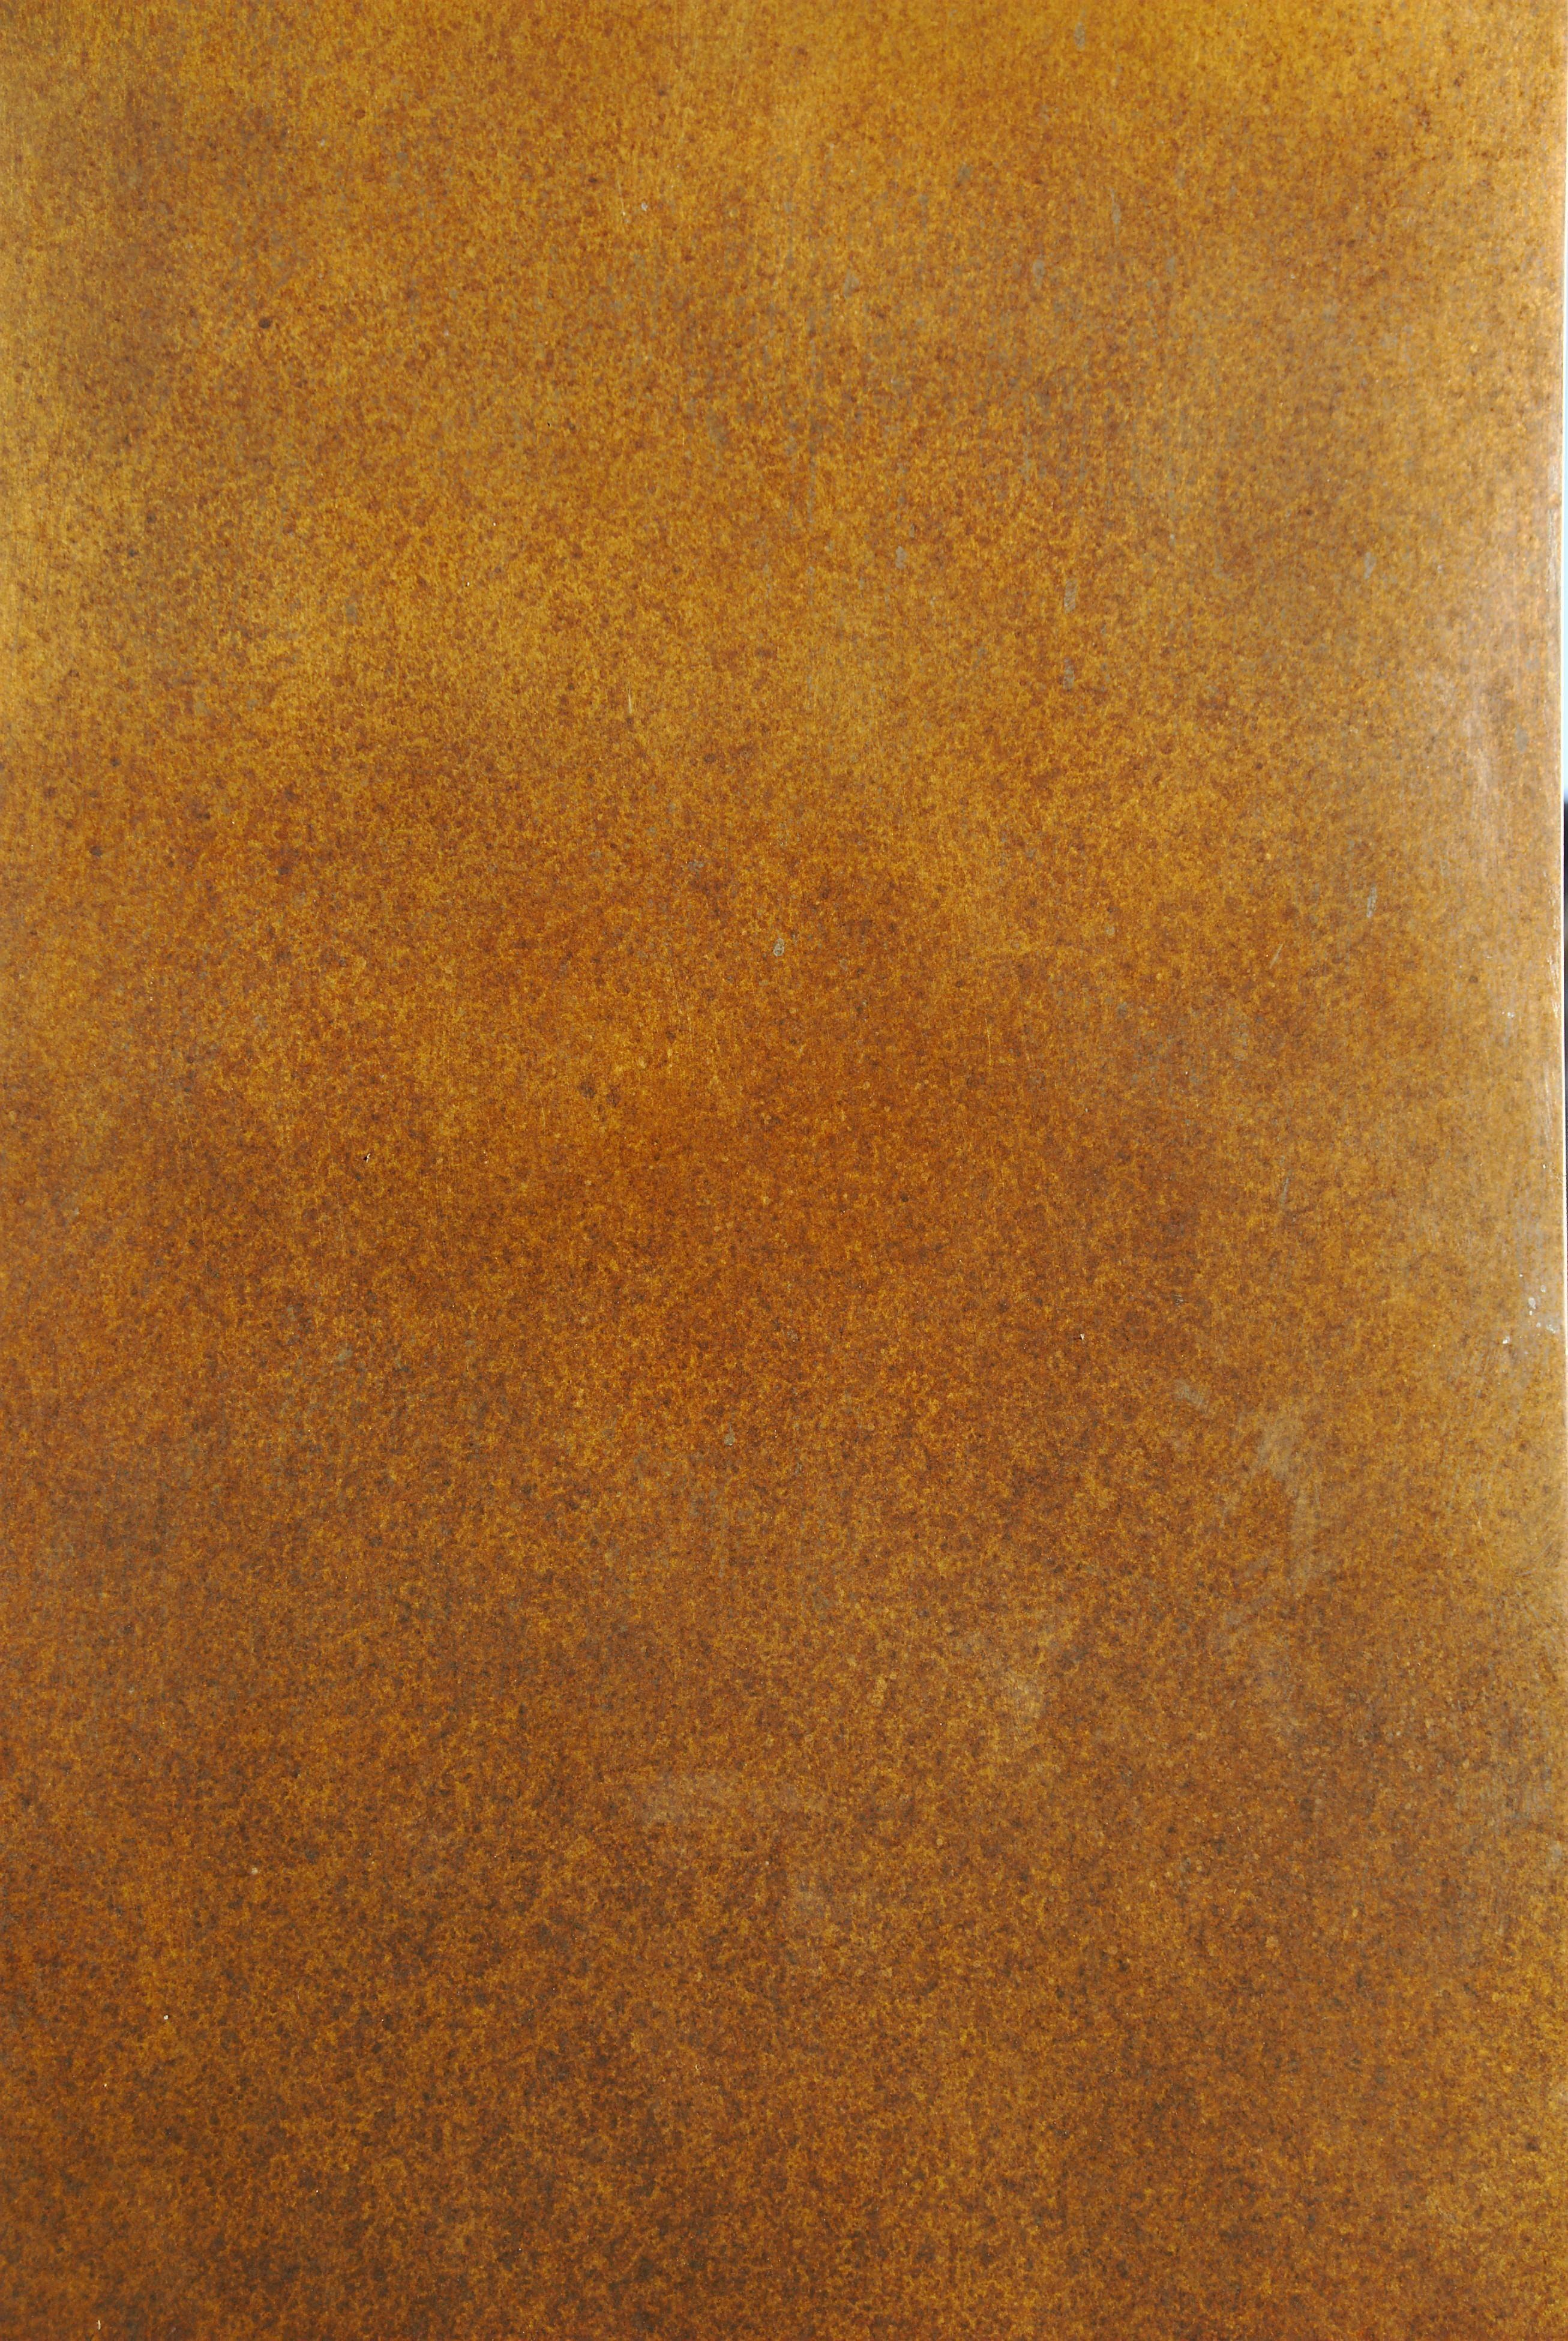 bronze texture map - Google Search | Studio 3 | Pinterest ...